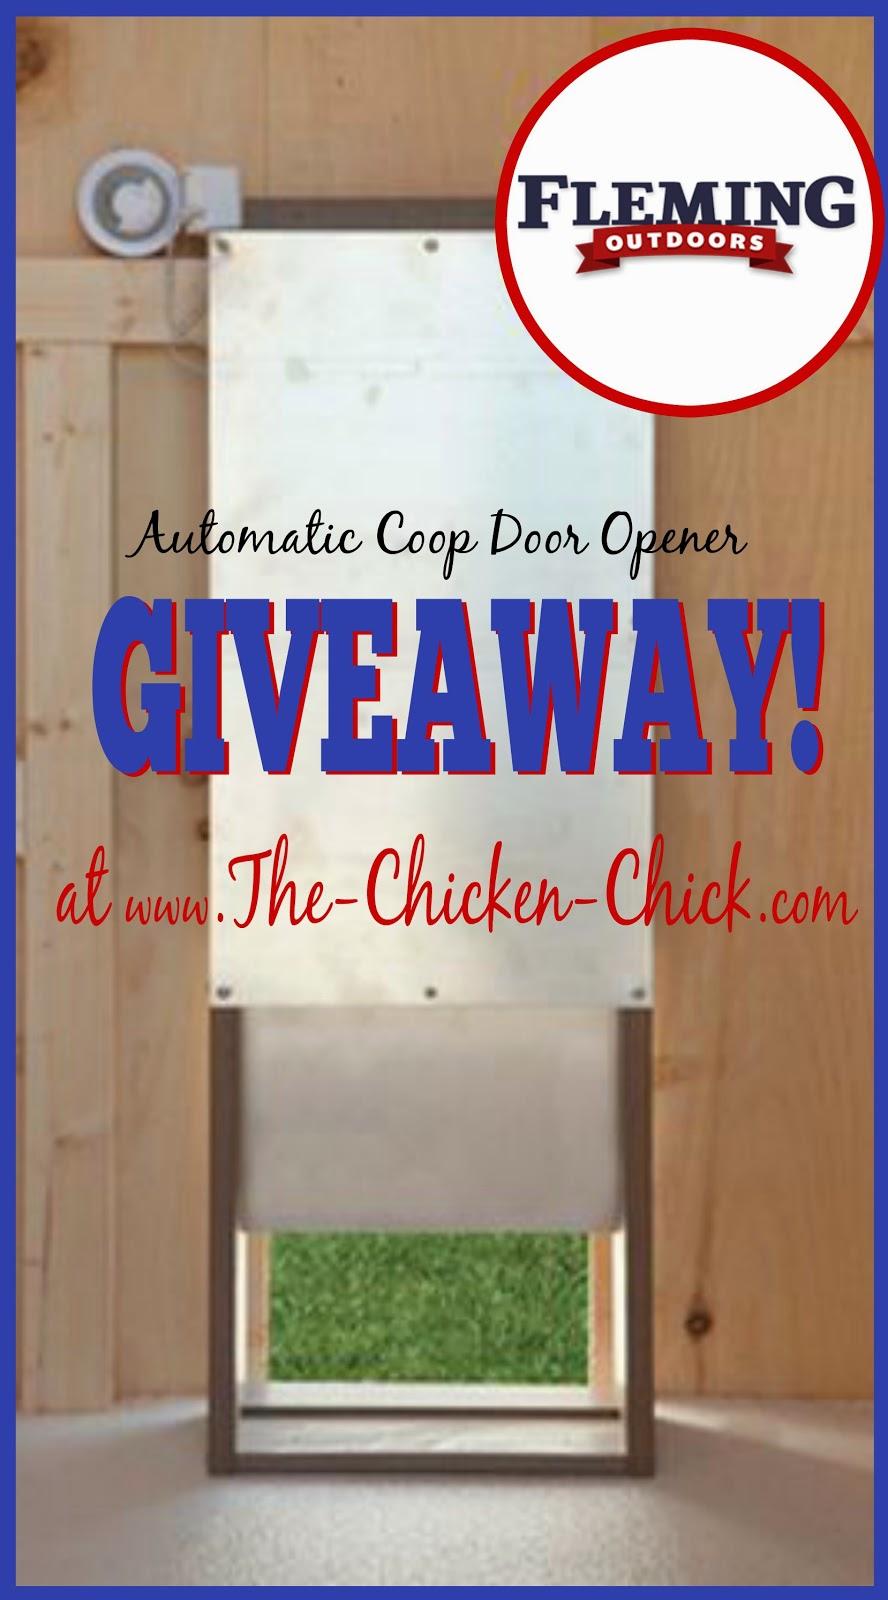 Giveaway of an Automatic Chicken Coop Door Opener, courtesy of Fleming